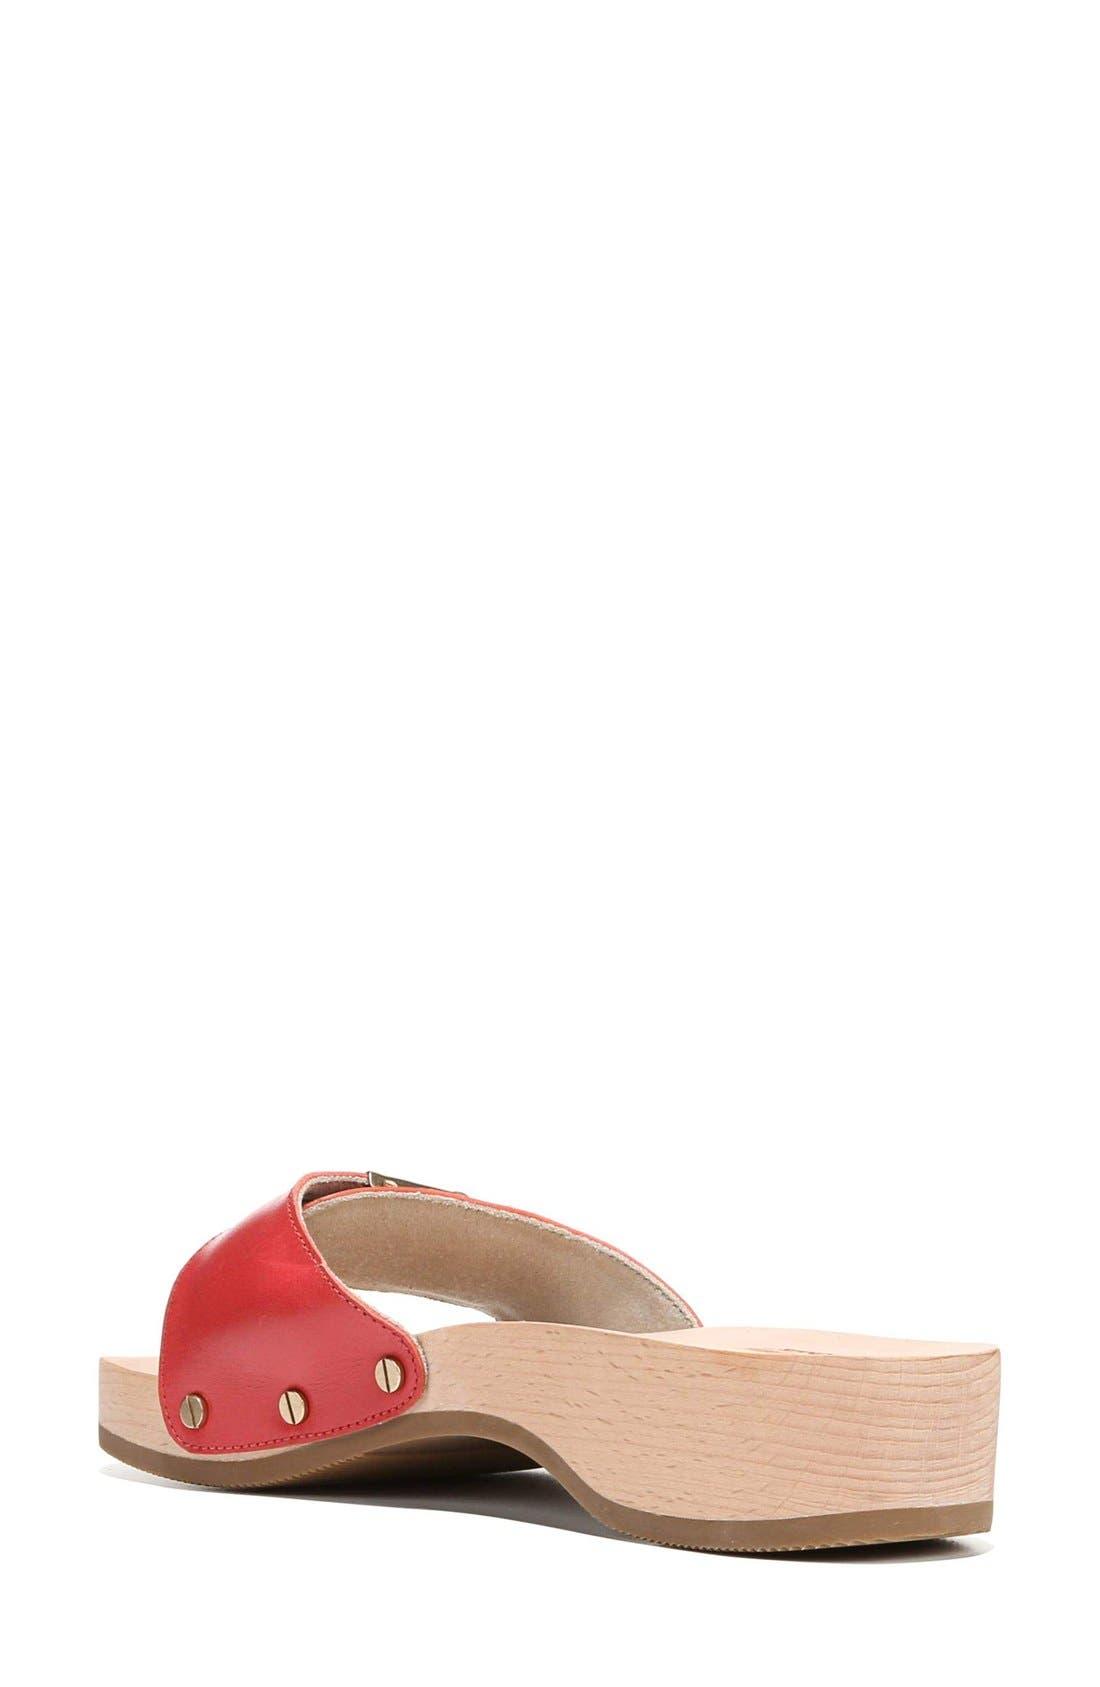 Original Collection Sandal,                             Alternate thumbnail 2, color,                             Red